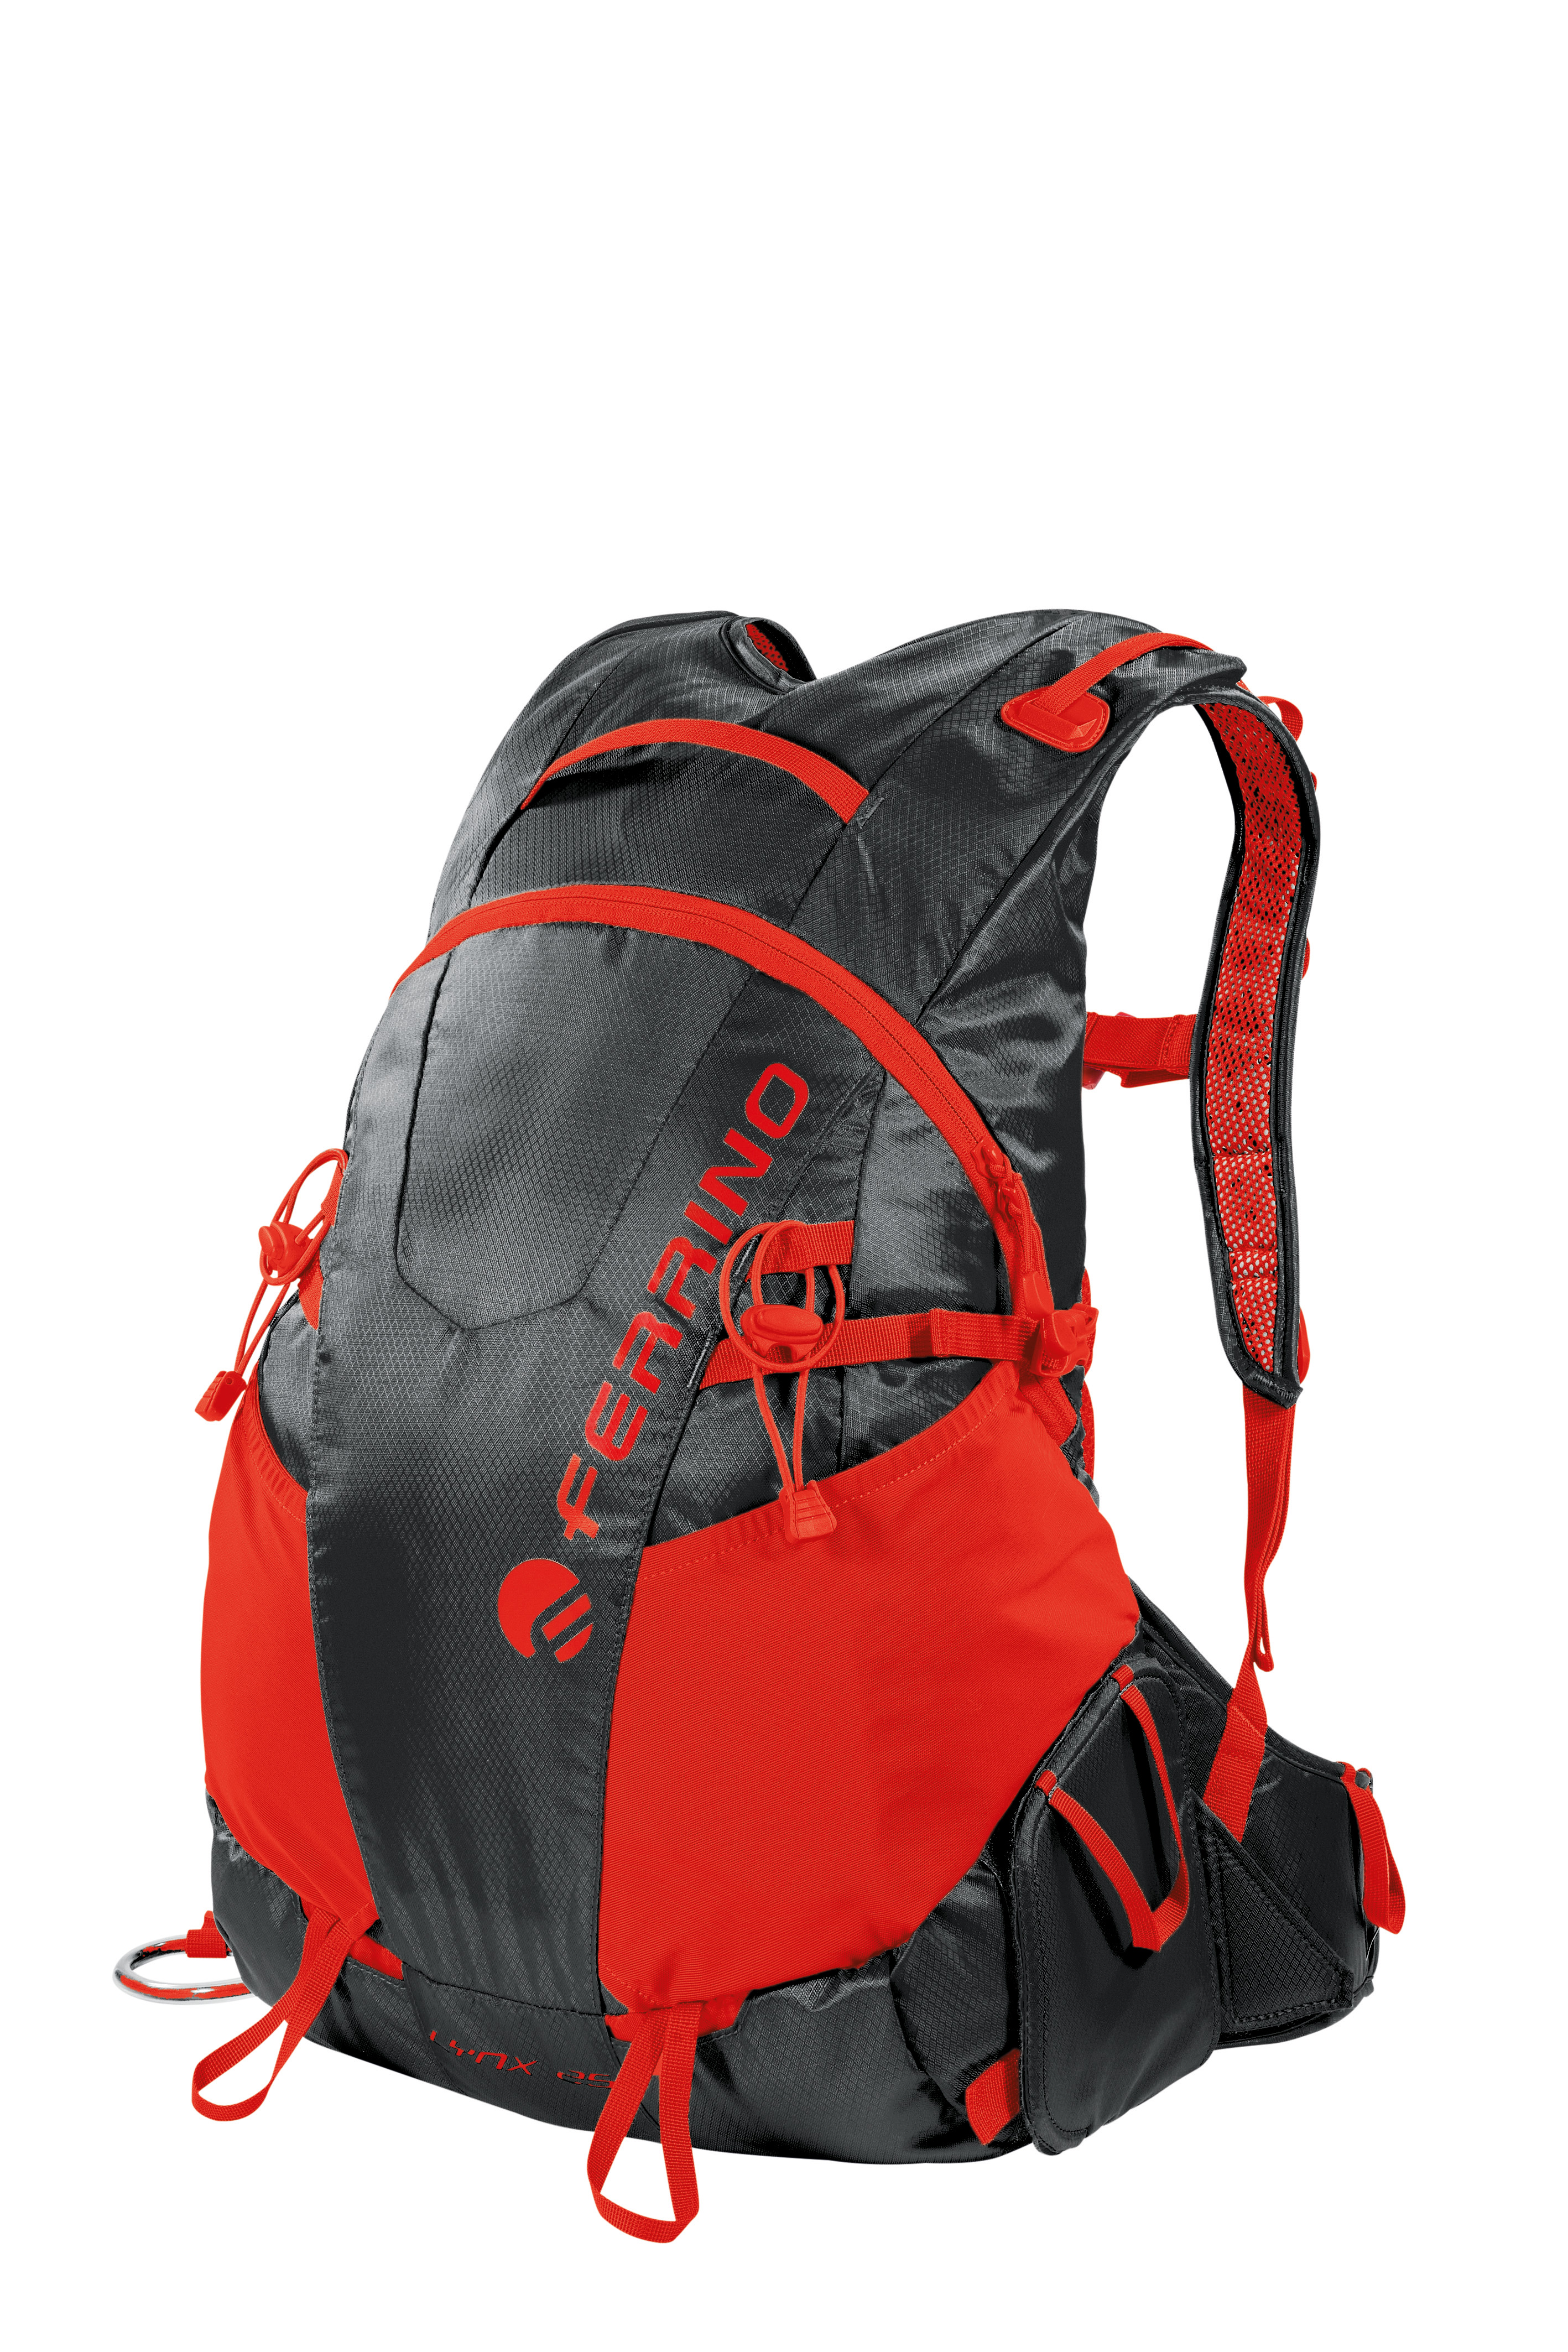 1dc103c0c16 Ski touringový batoh Lynx 25. Lynx 25